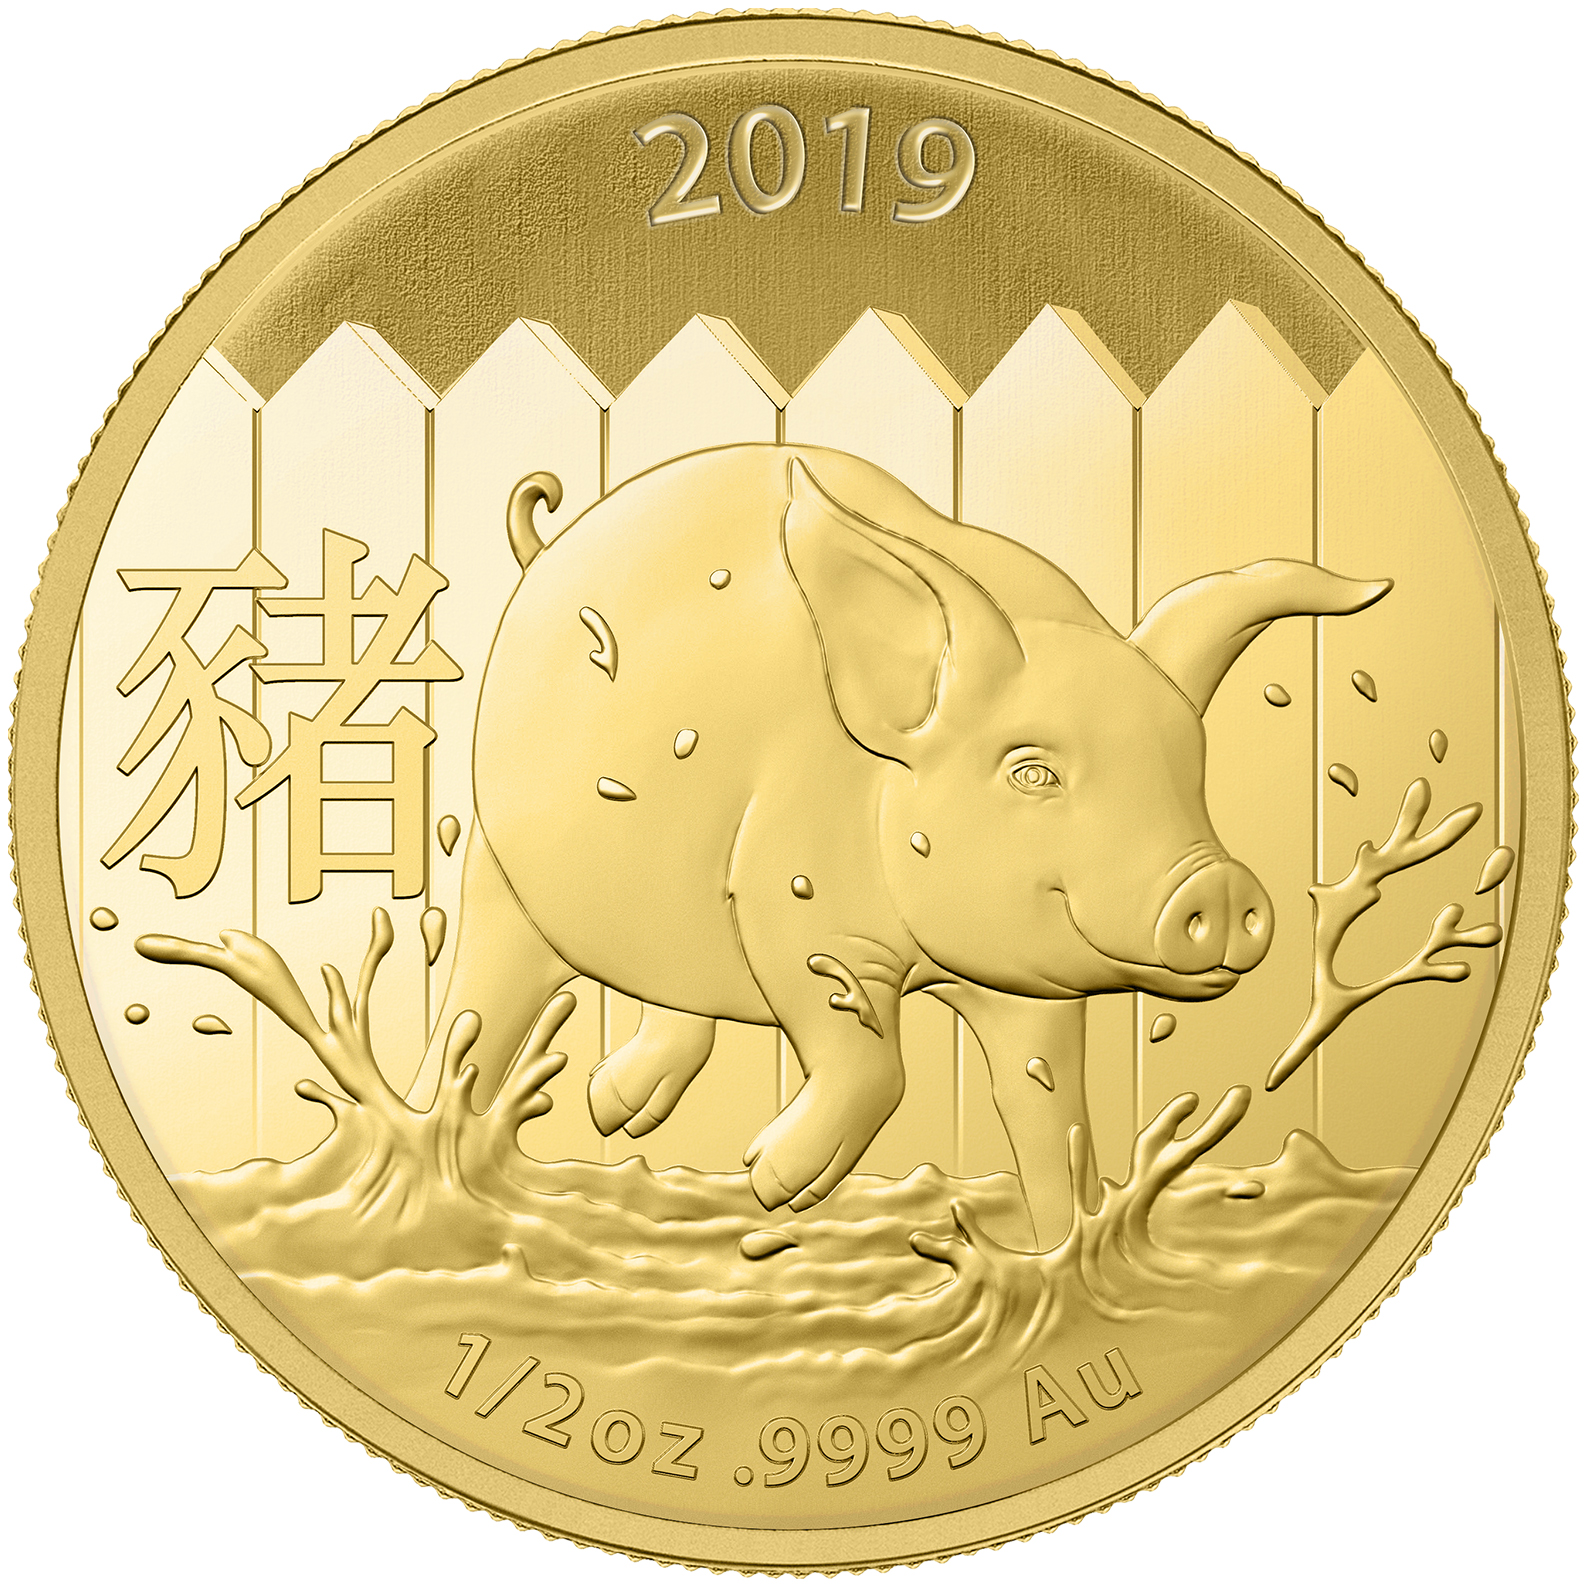 2019 Australia 1/2 oz Gold Lunar Pig BU